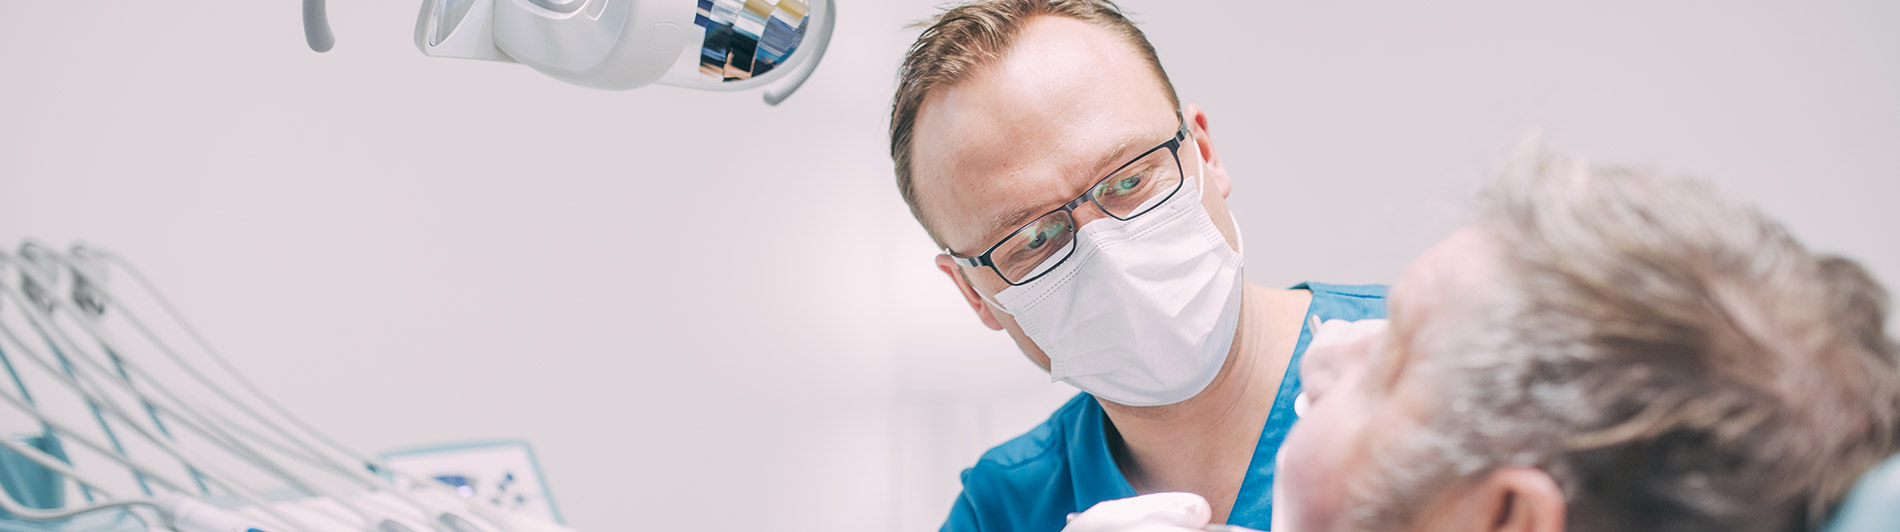 Zahnfüllungen MKG Plus Münster